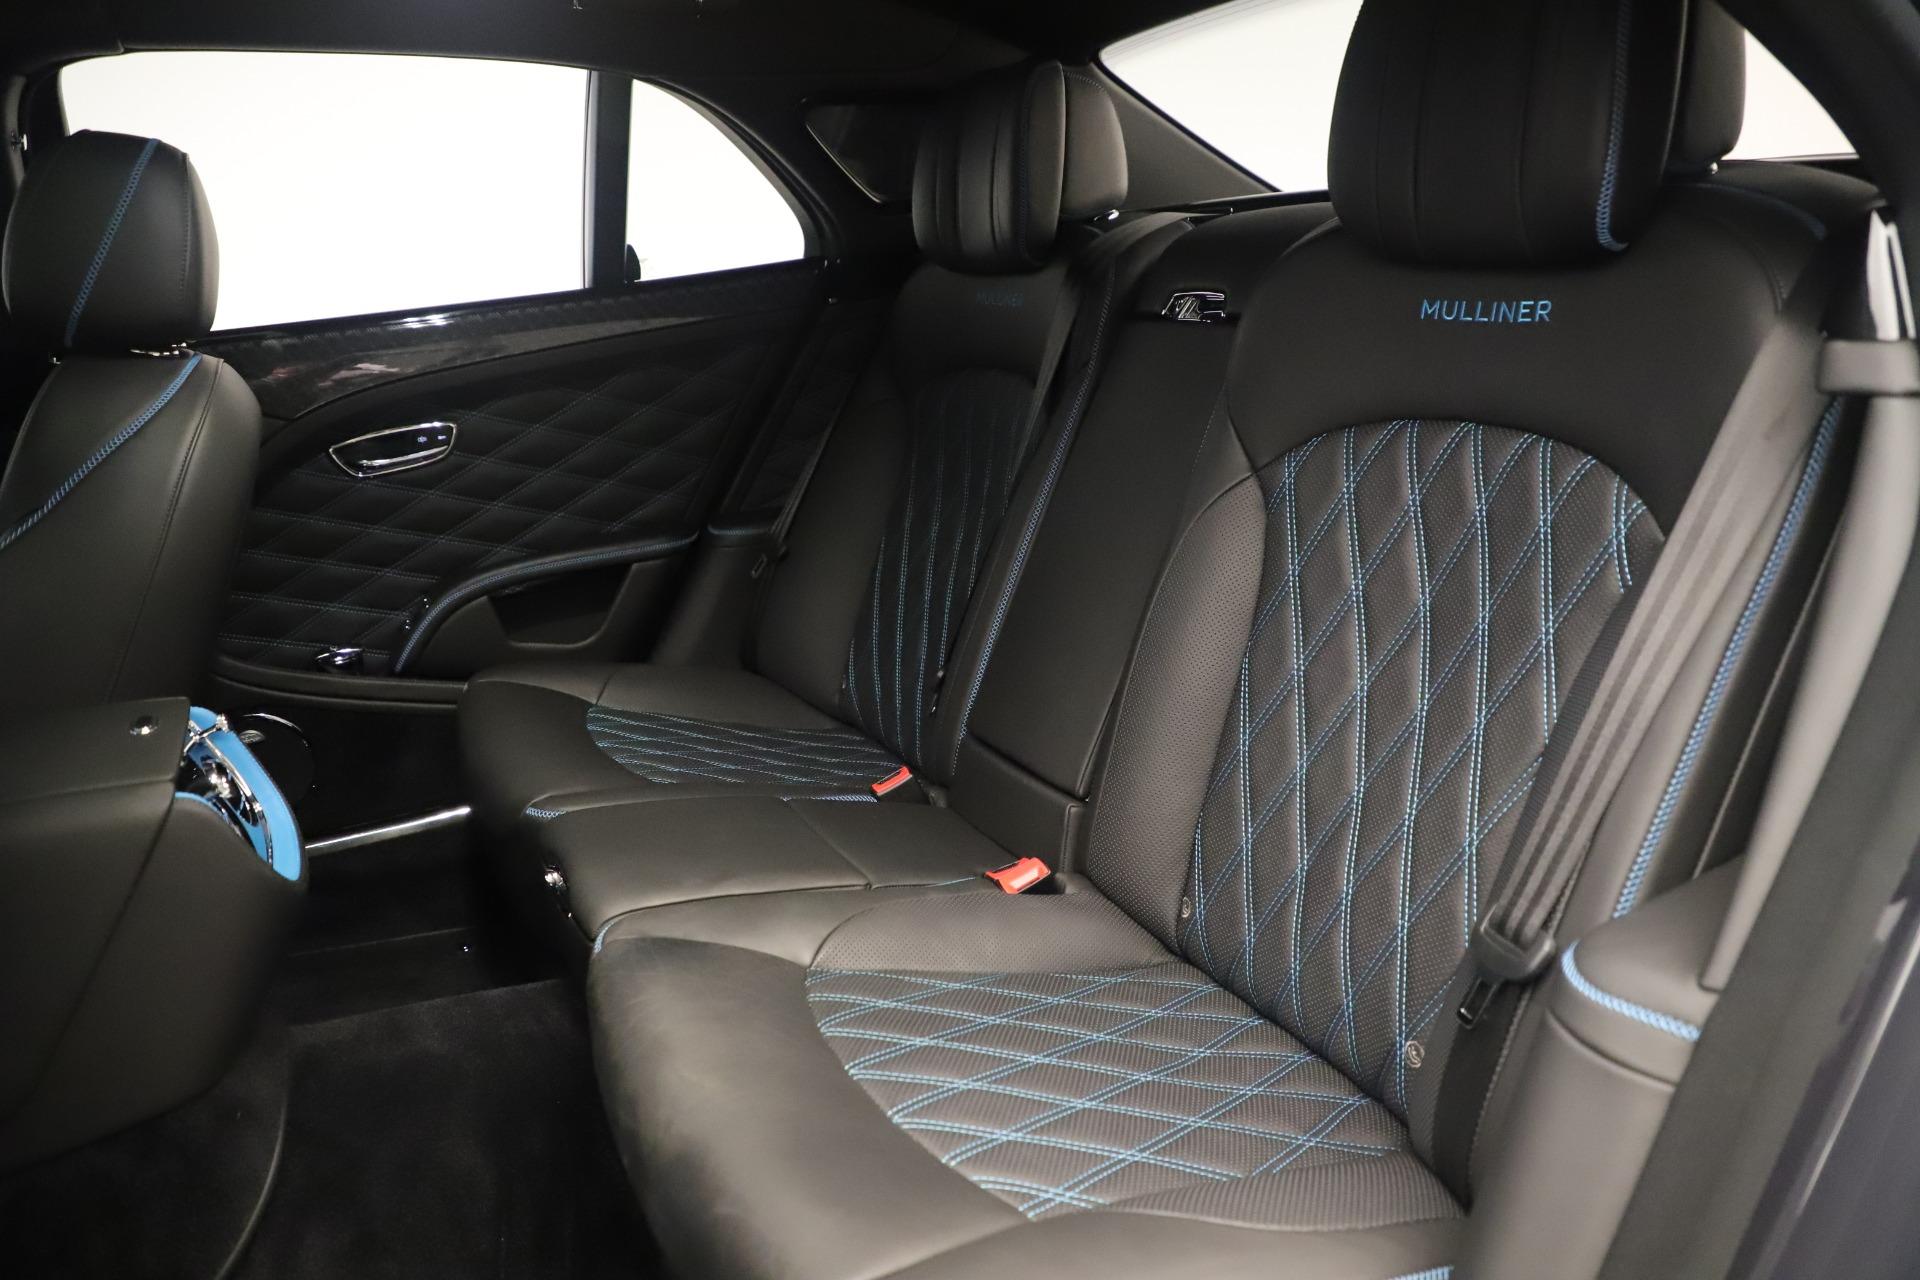 Used 2018 Bentley Mulsanne Speed Design Series For Sale In Westport, CT 3405_p25